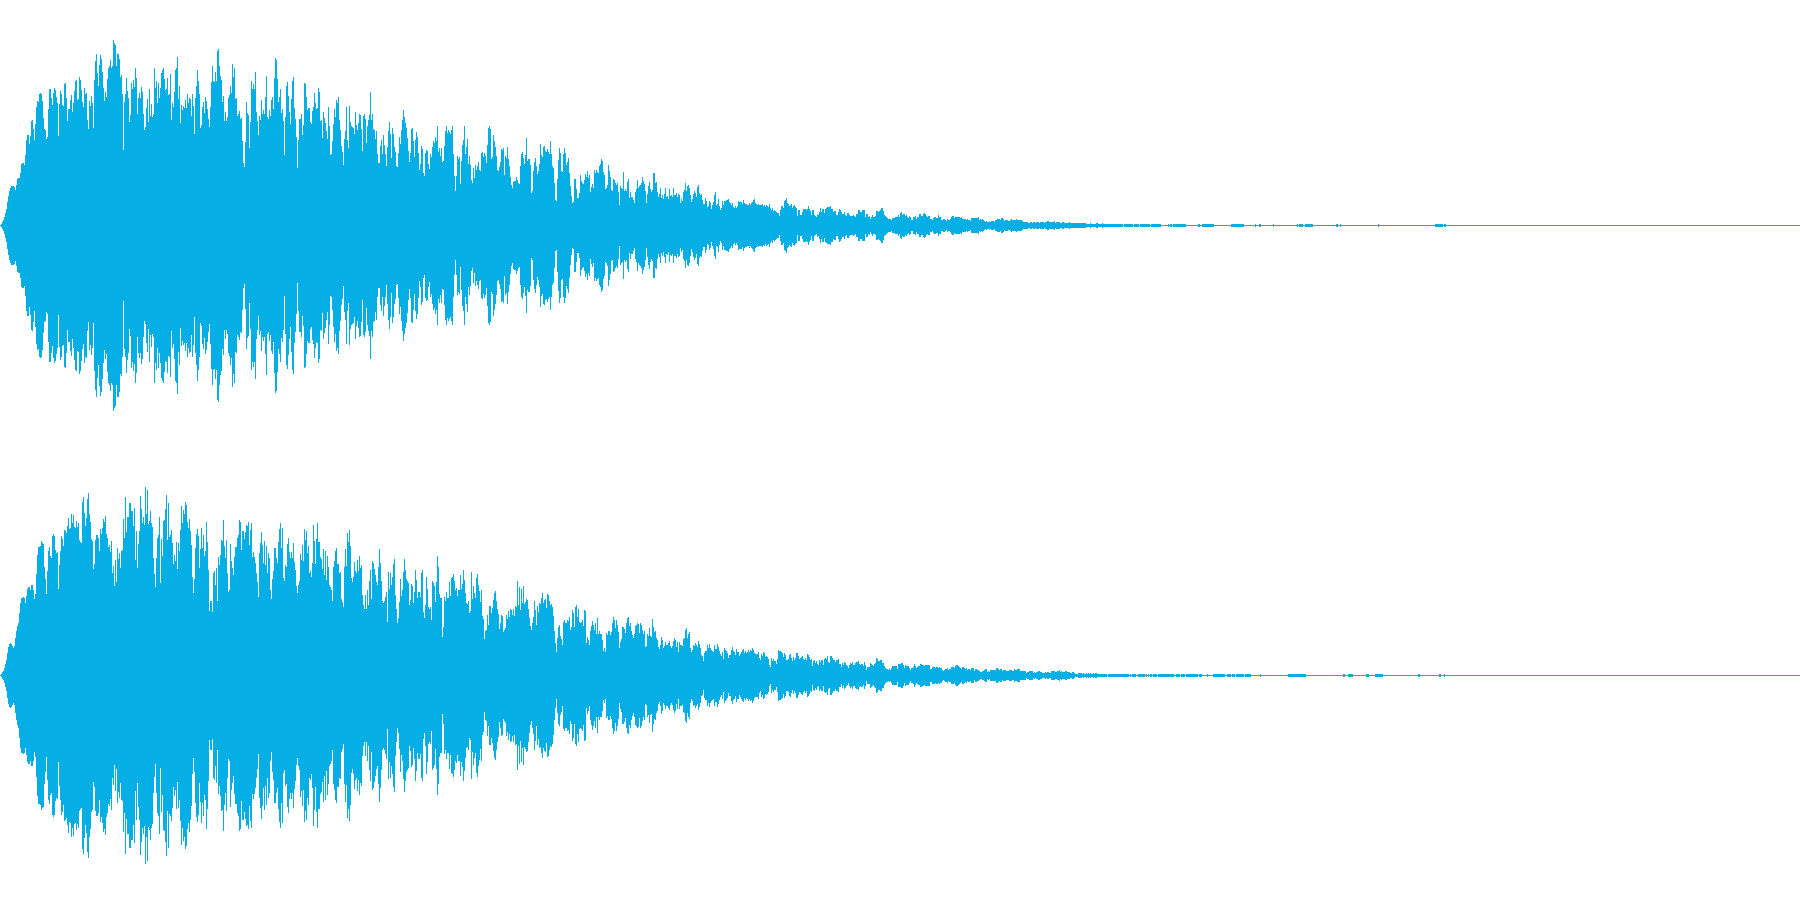 Anime ゆらゆらと風に飛ばされる音の再生済みの波形